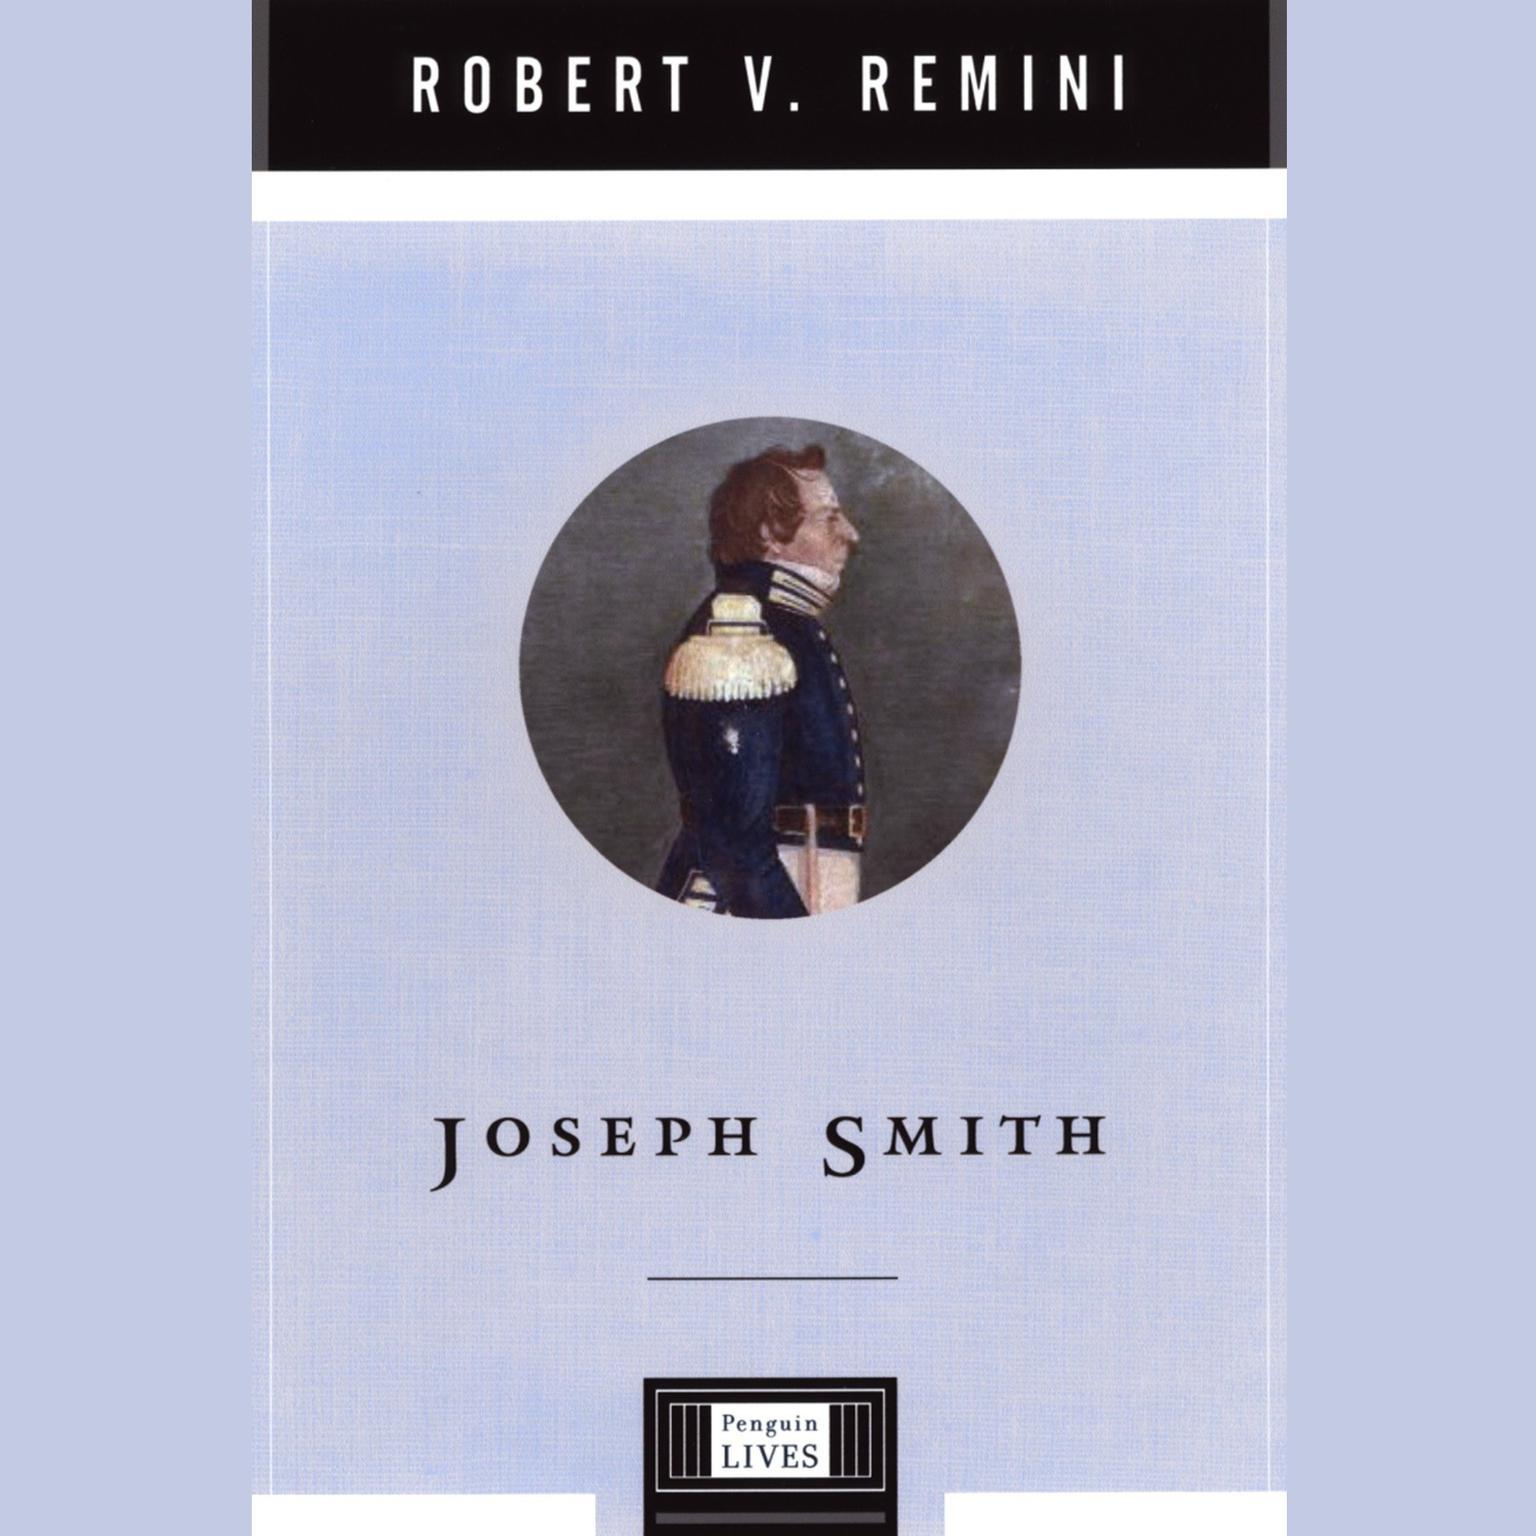 Joseph Smith Audiobook, by Robert V. Remini